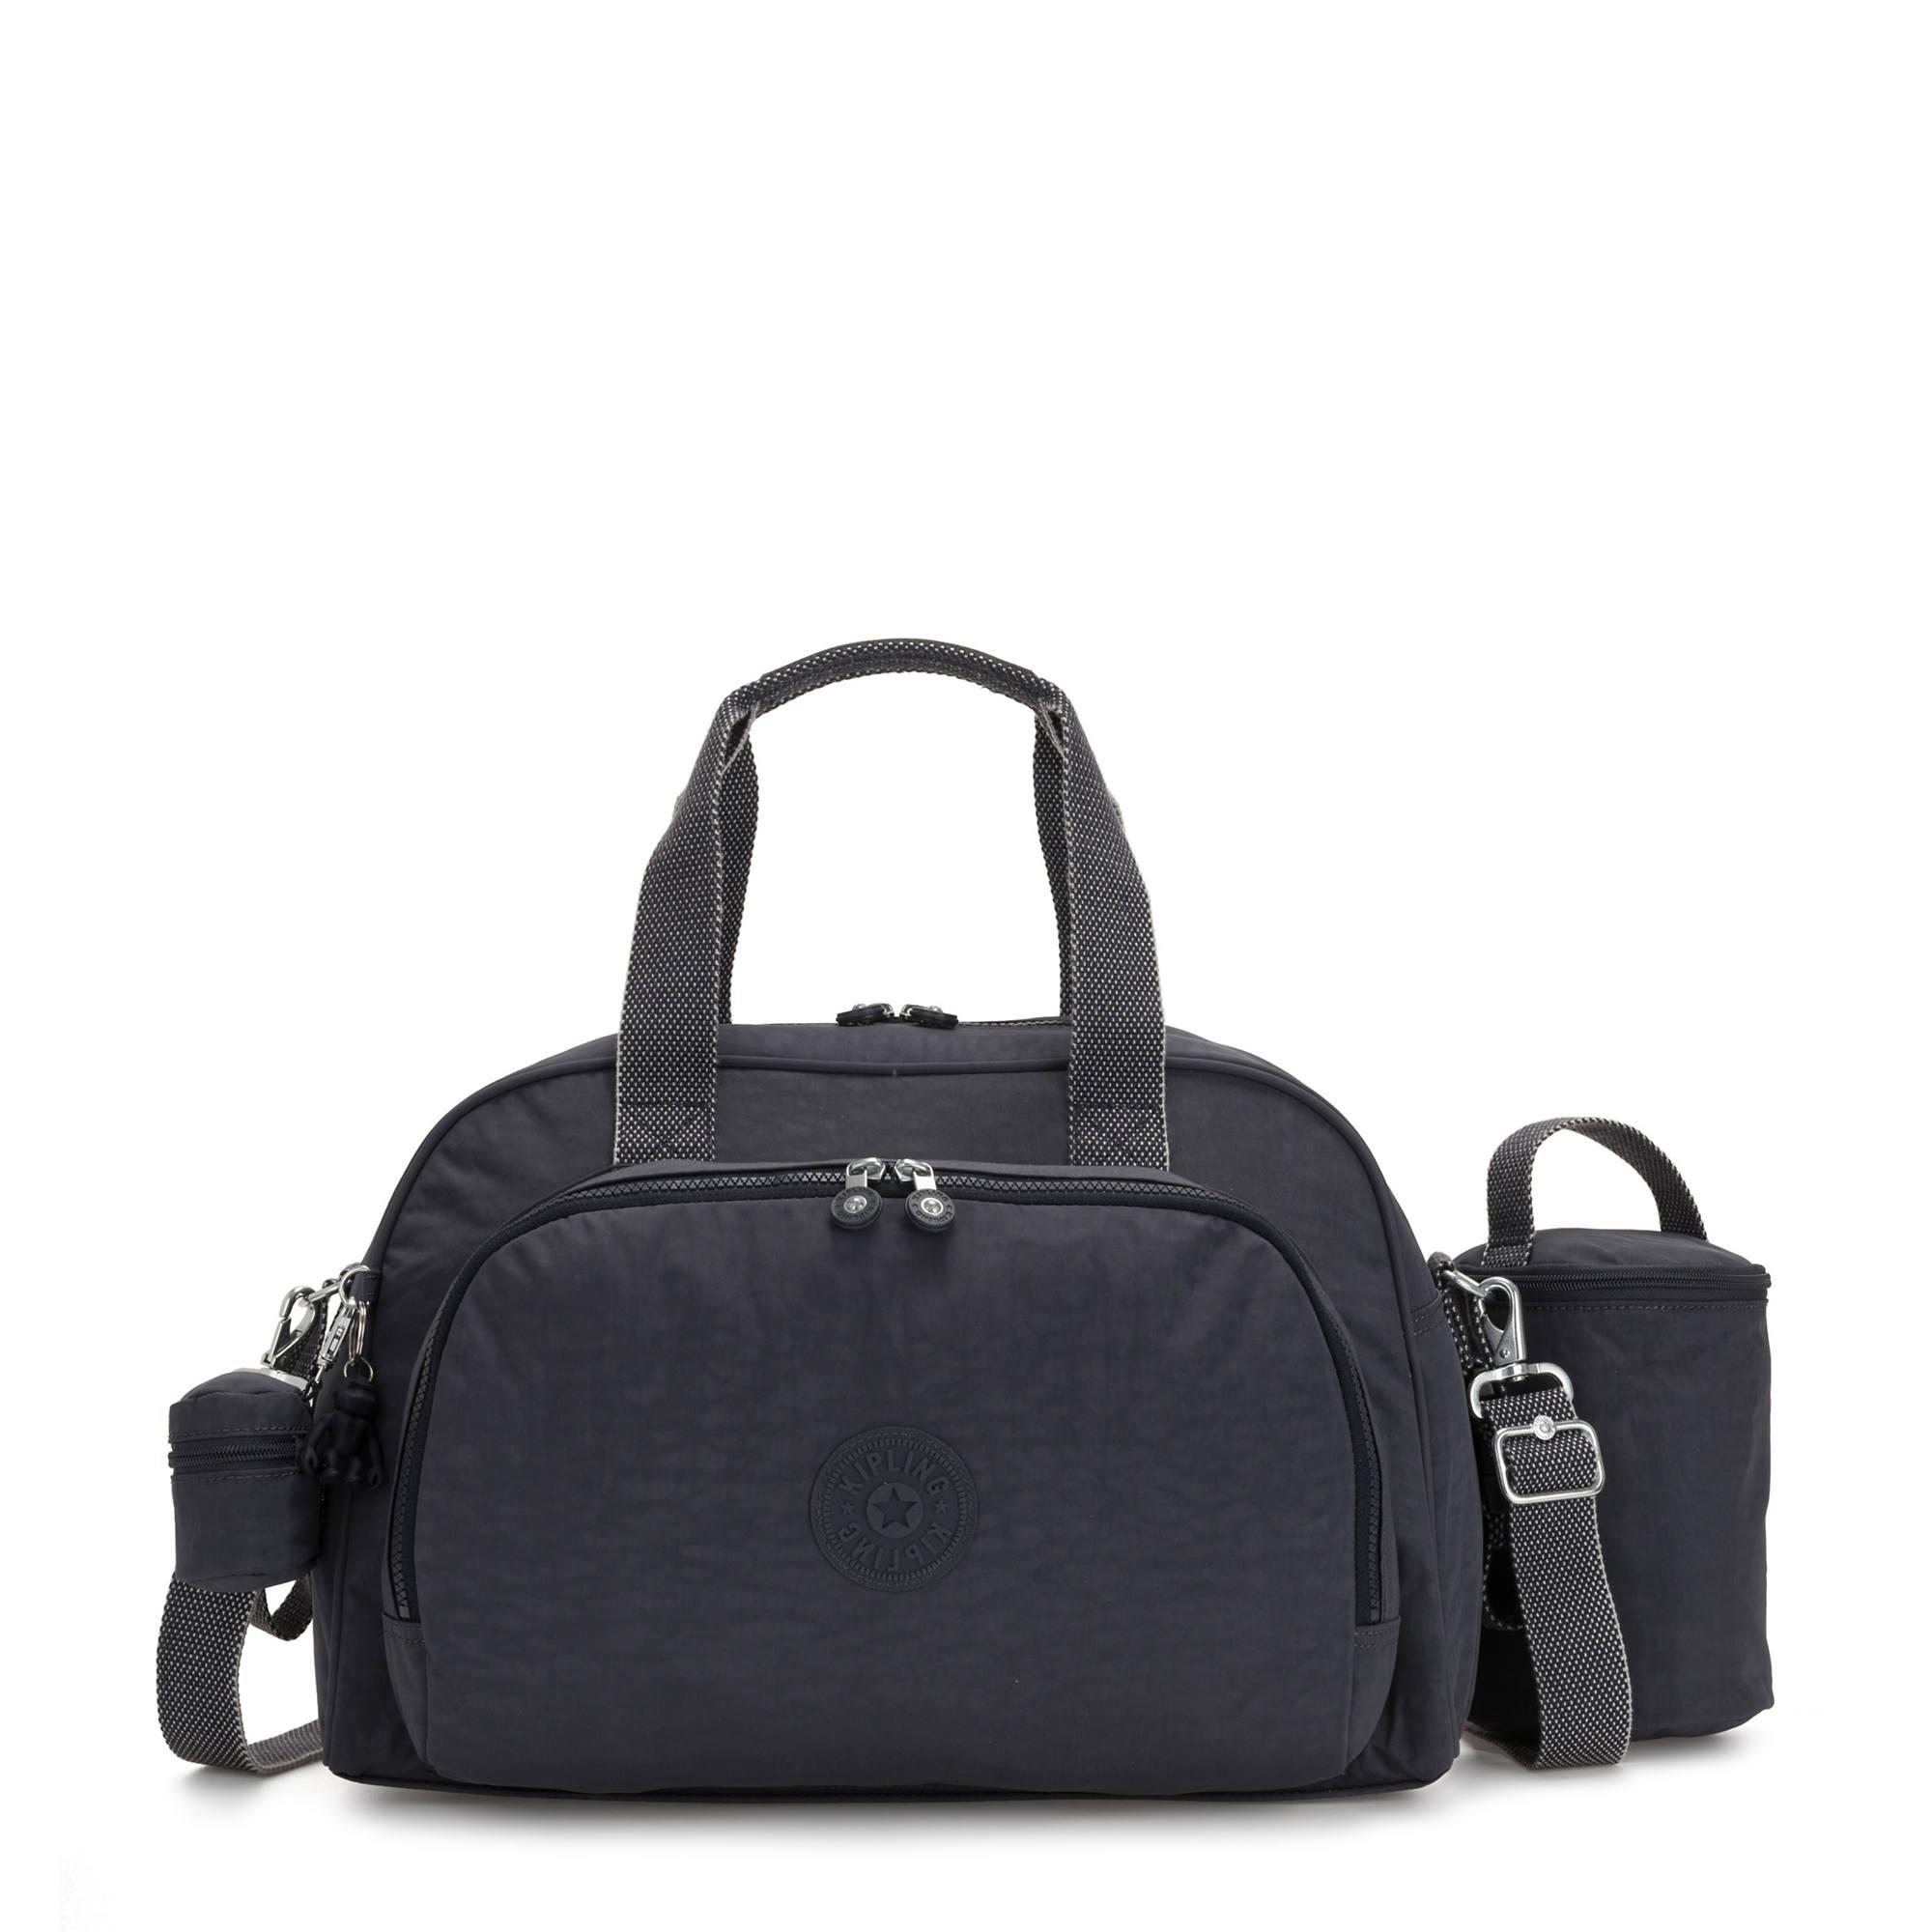 Baby Messenger Changing Bags Maternity Overnight Hospital Shoulder Bags Black